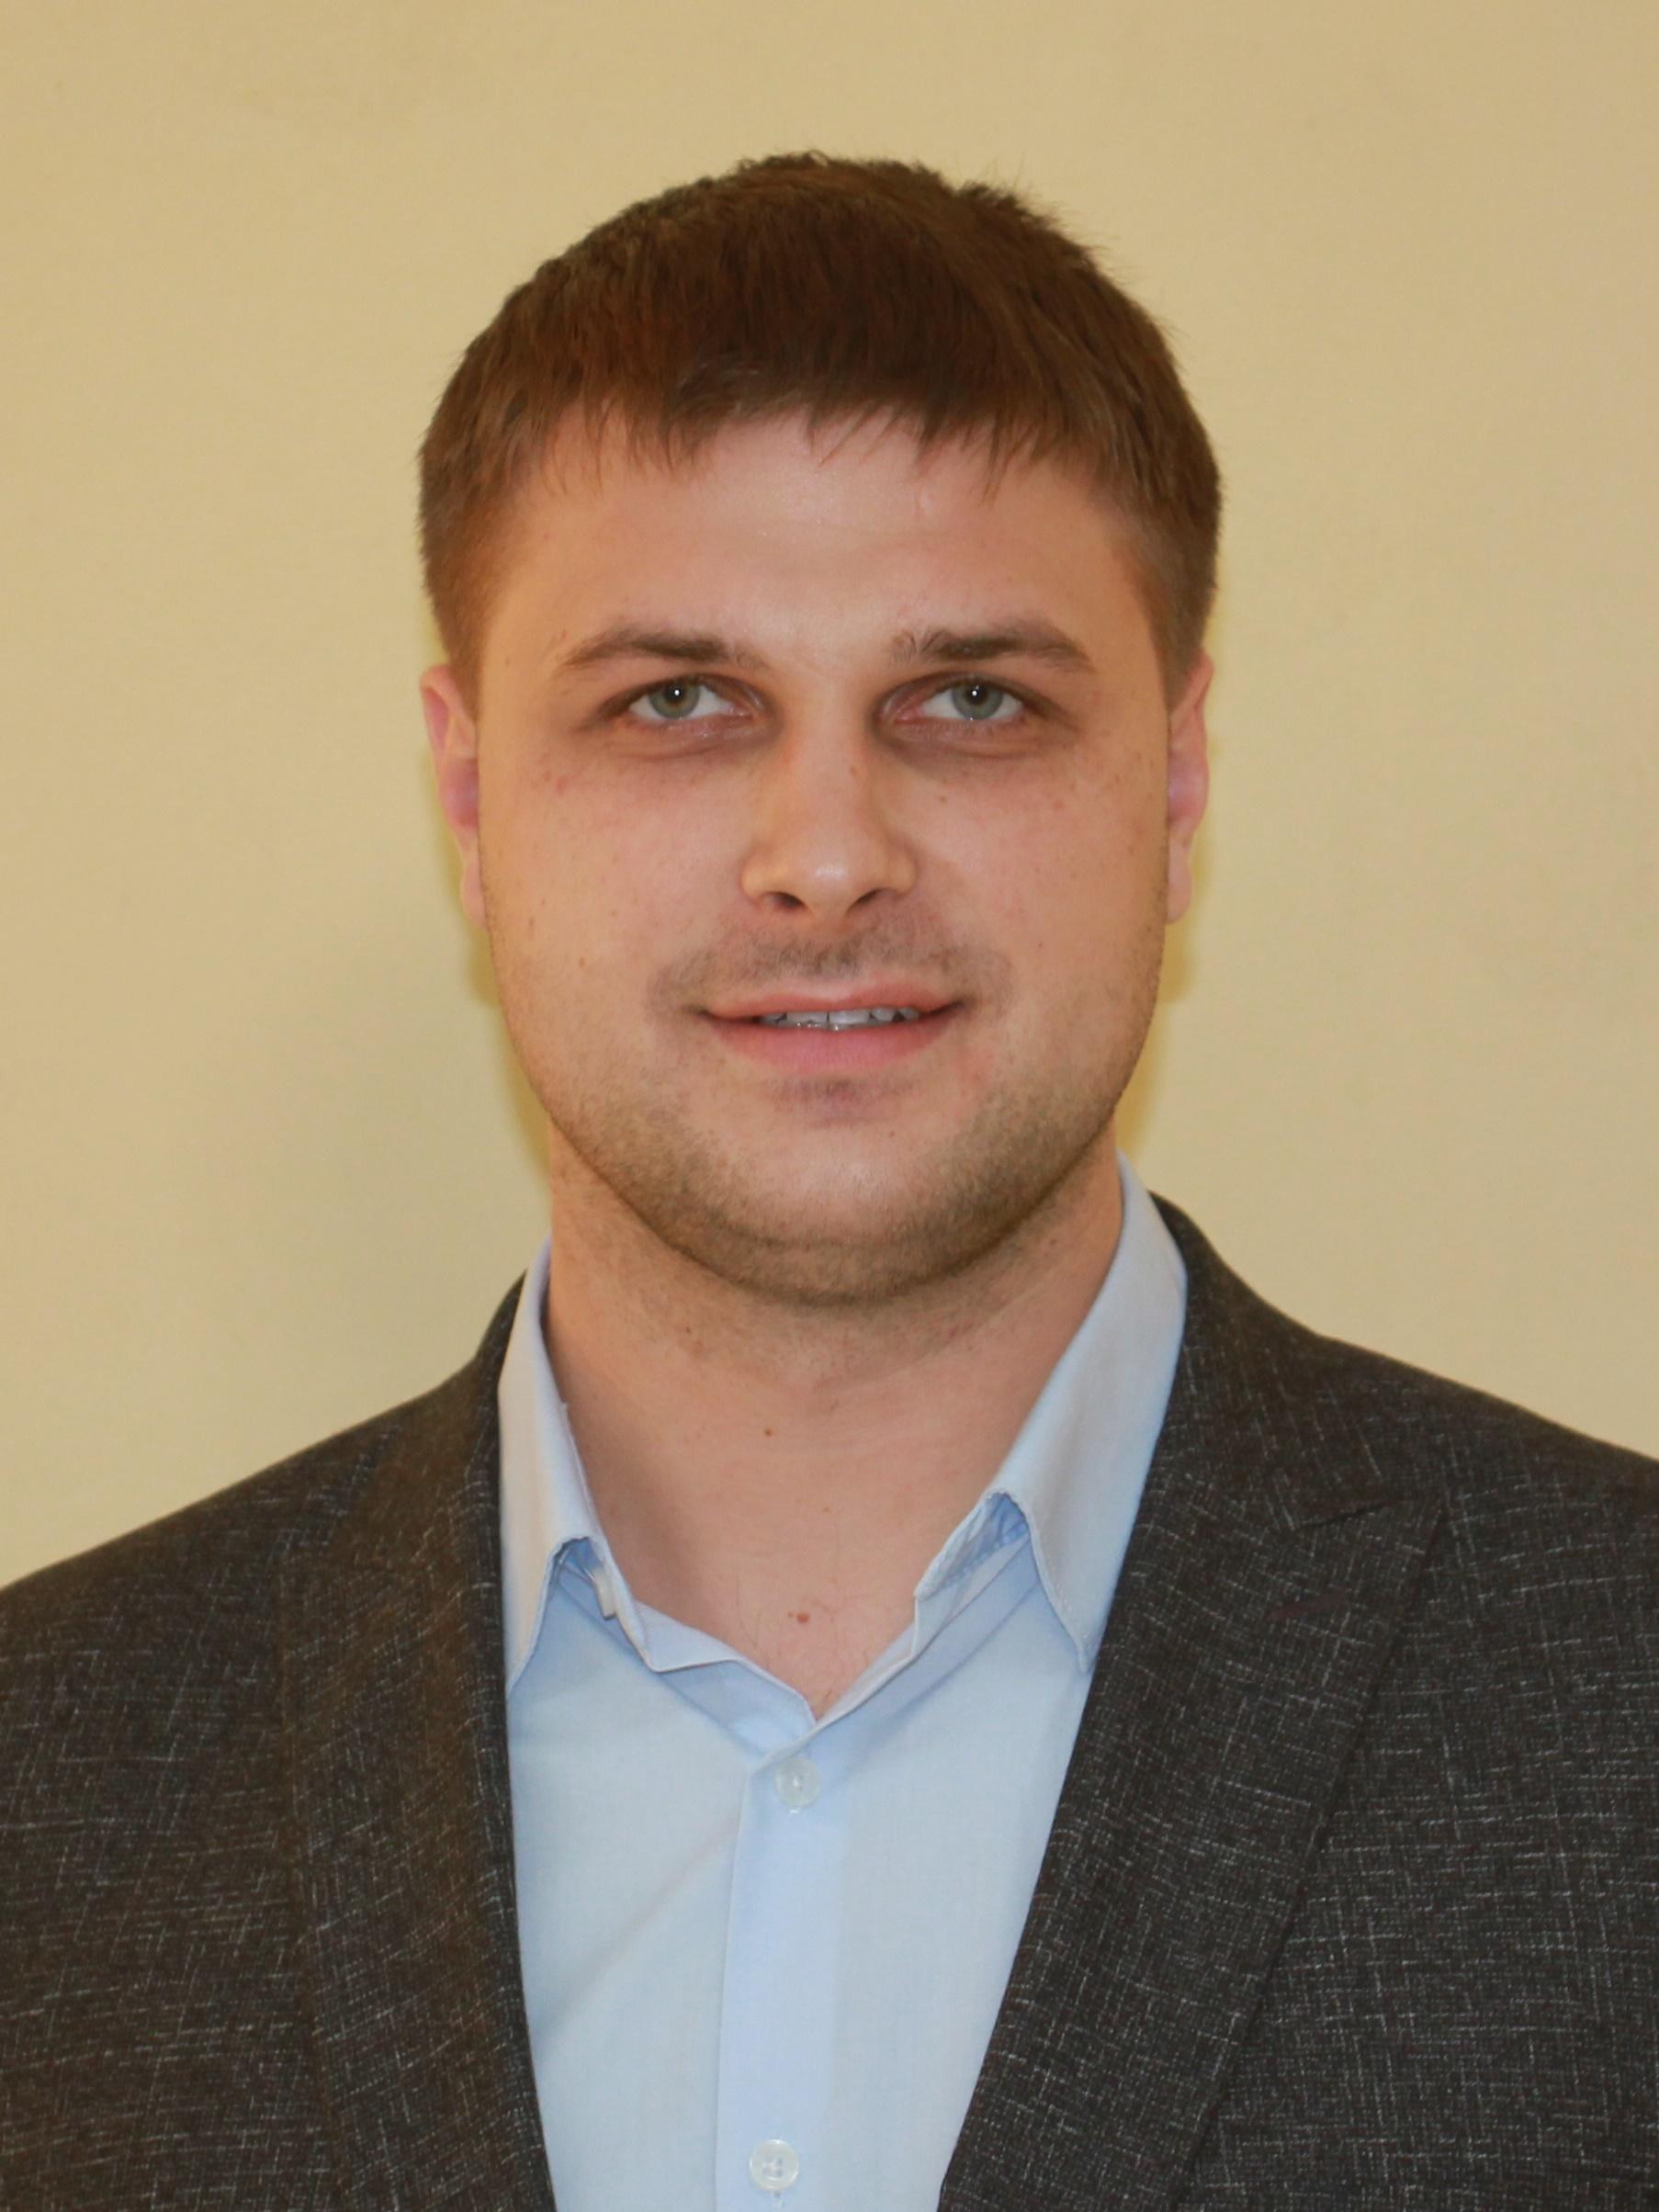 Вакарчук Кирилл Алексеевич